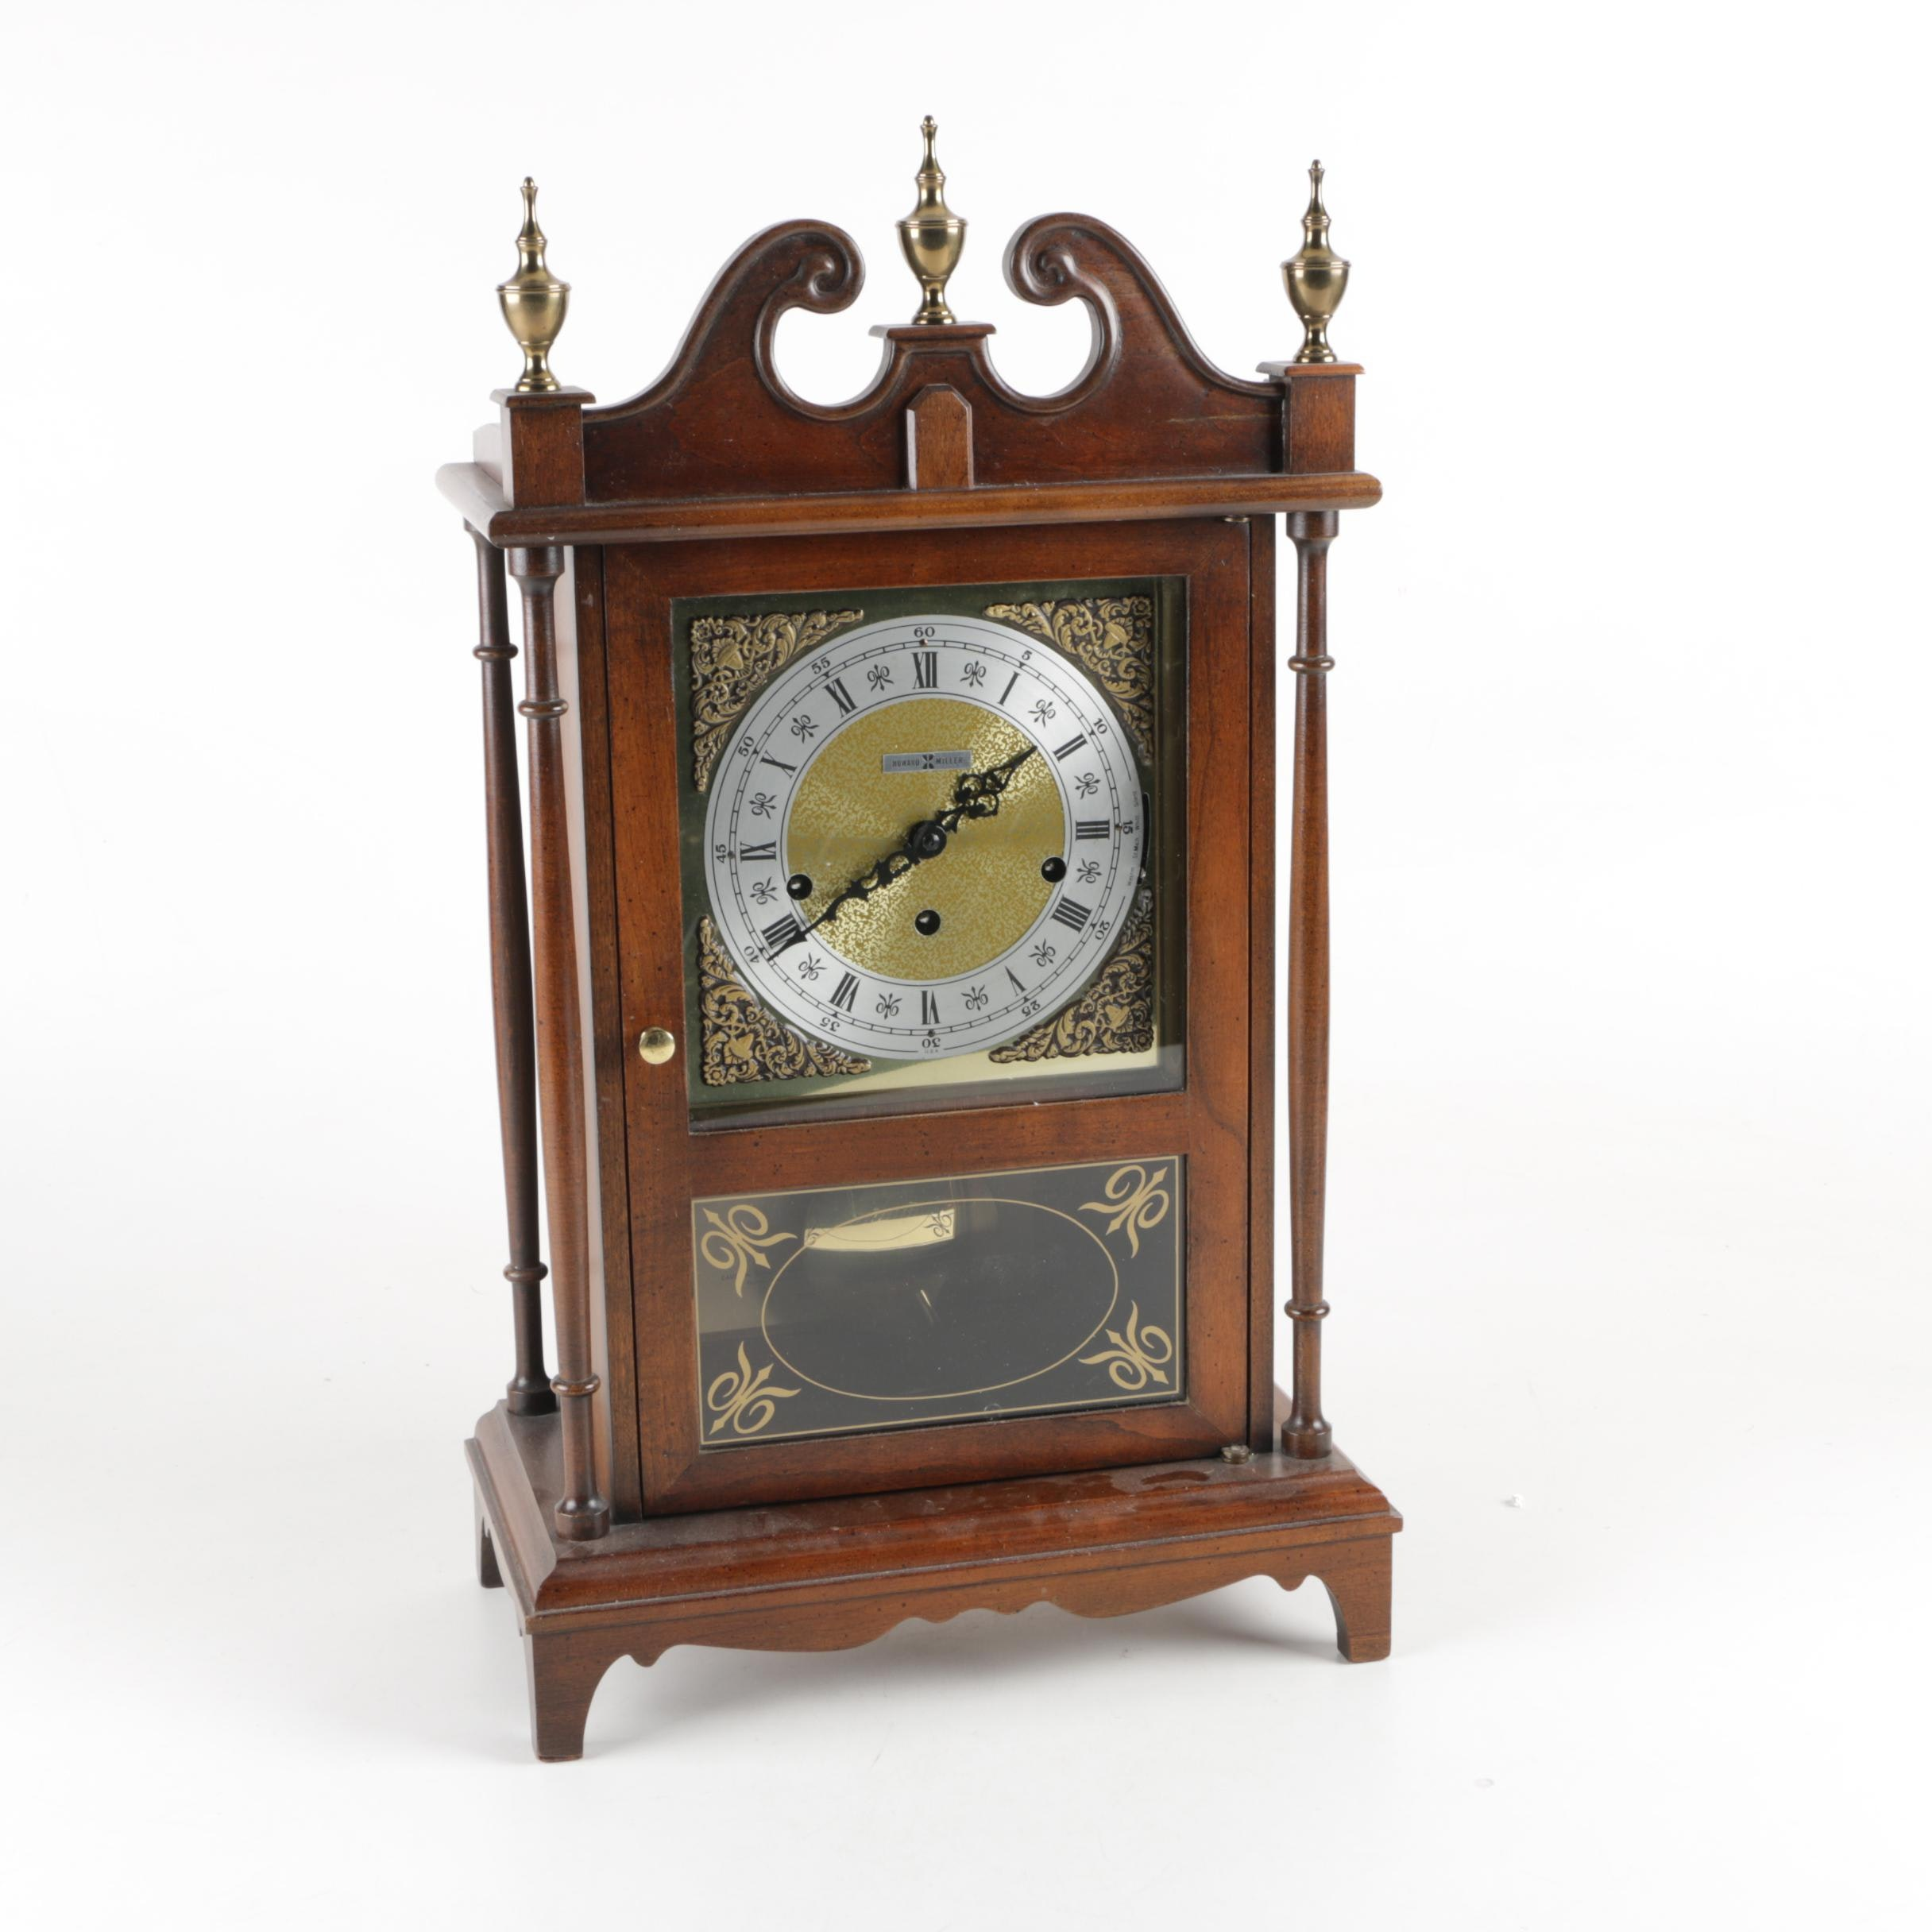 Howard miller chiming mantel clocks